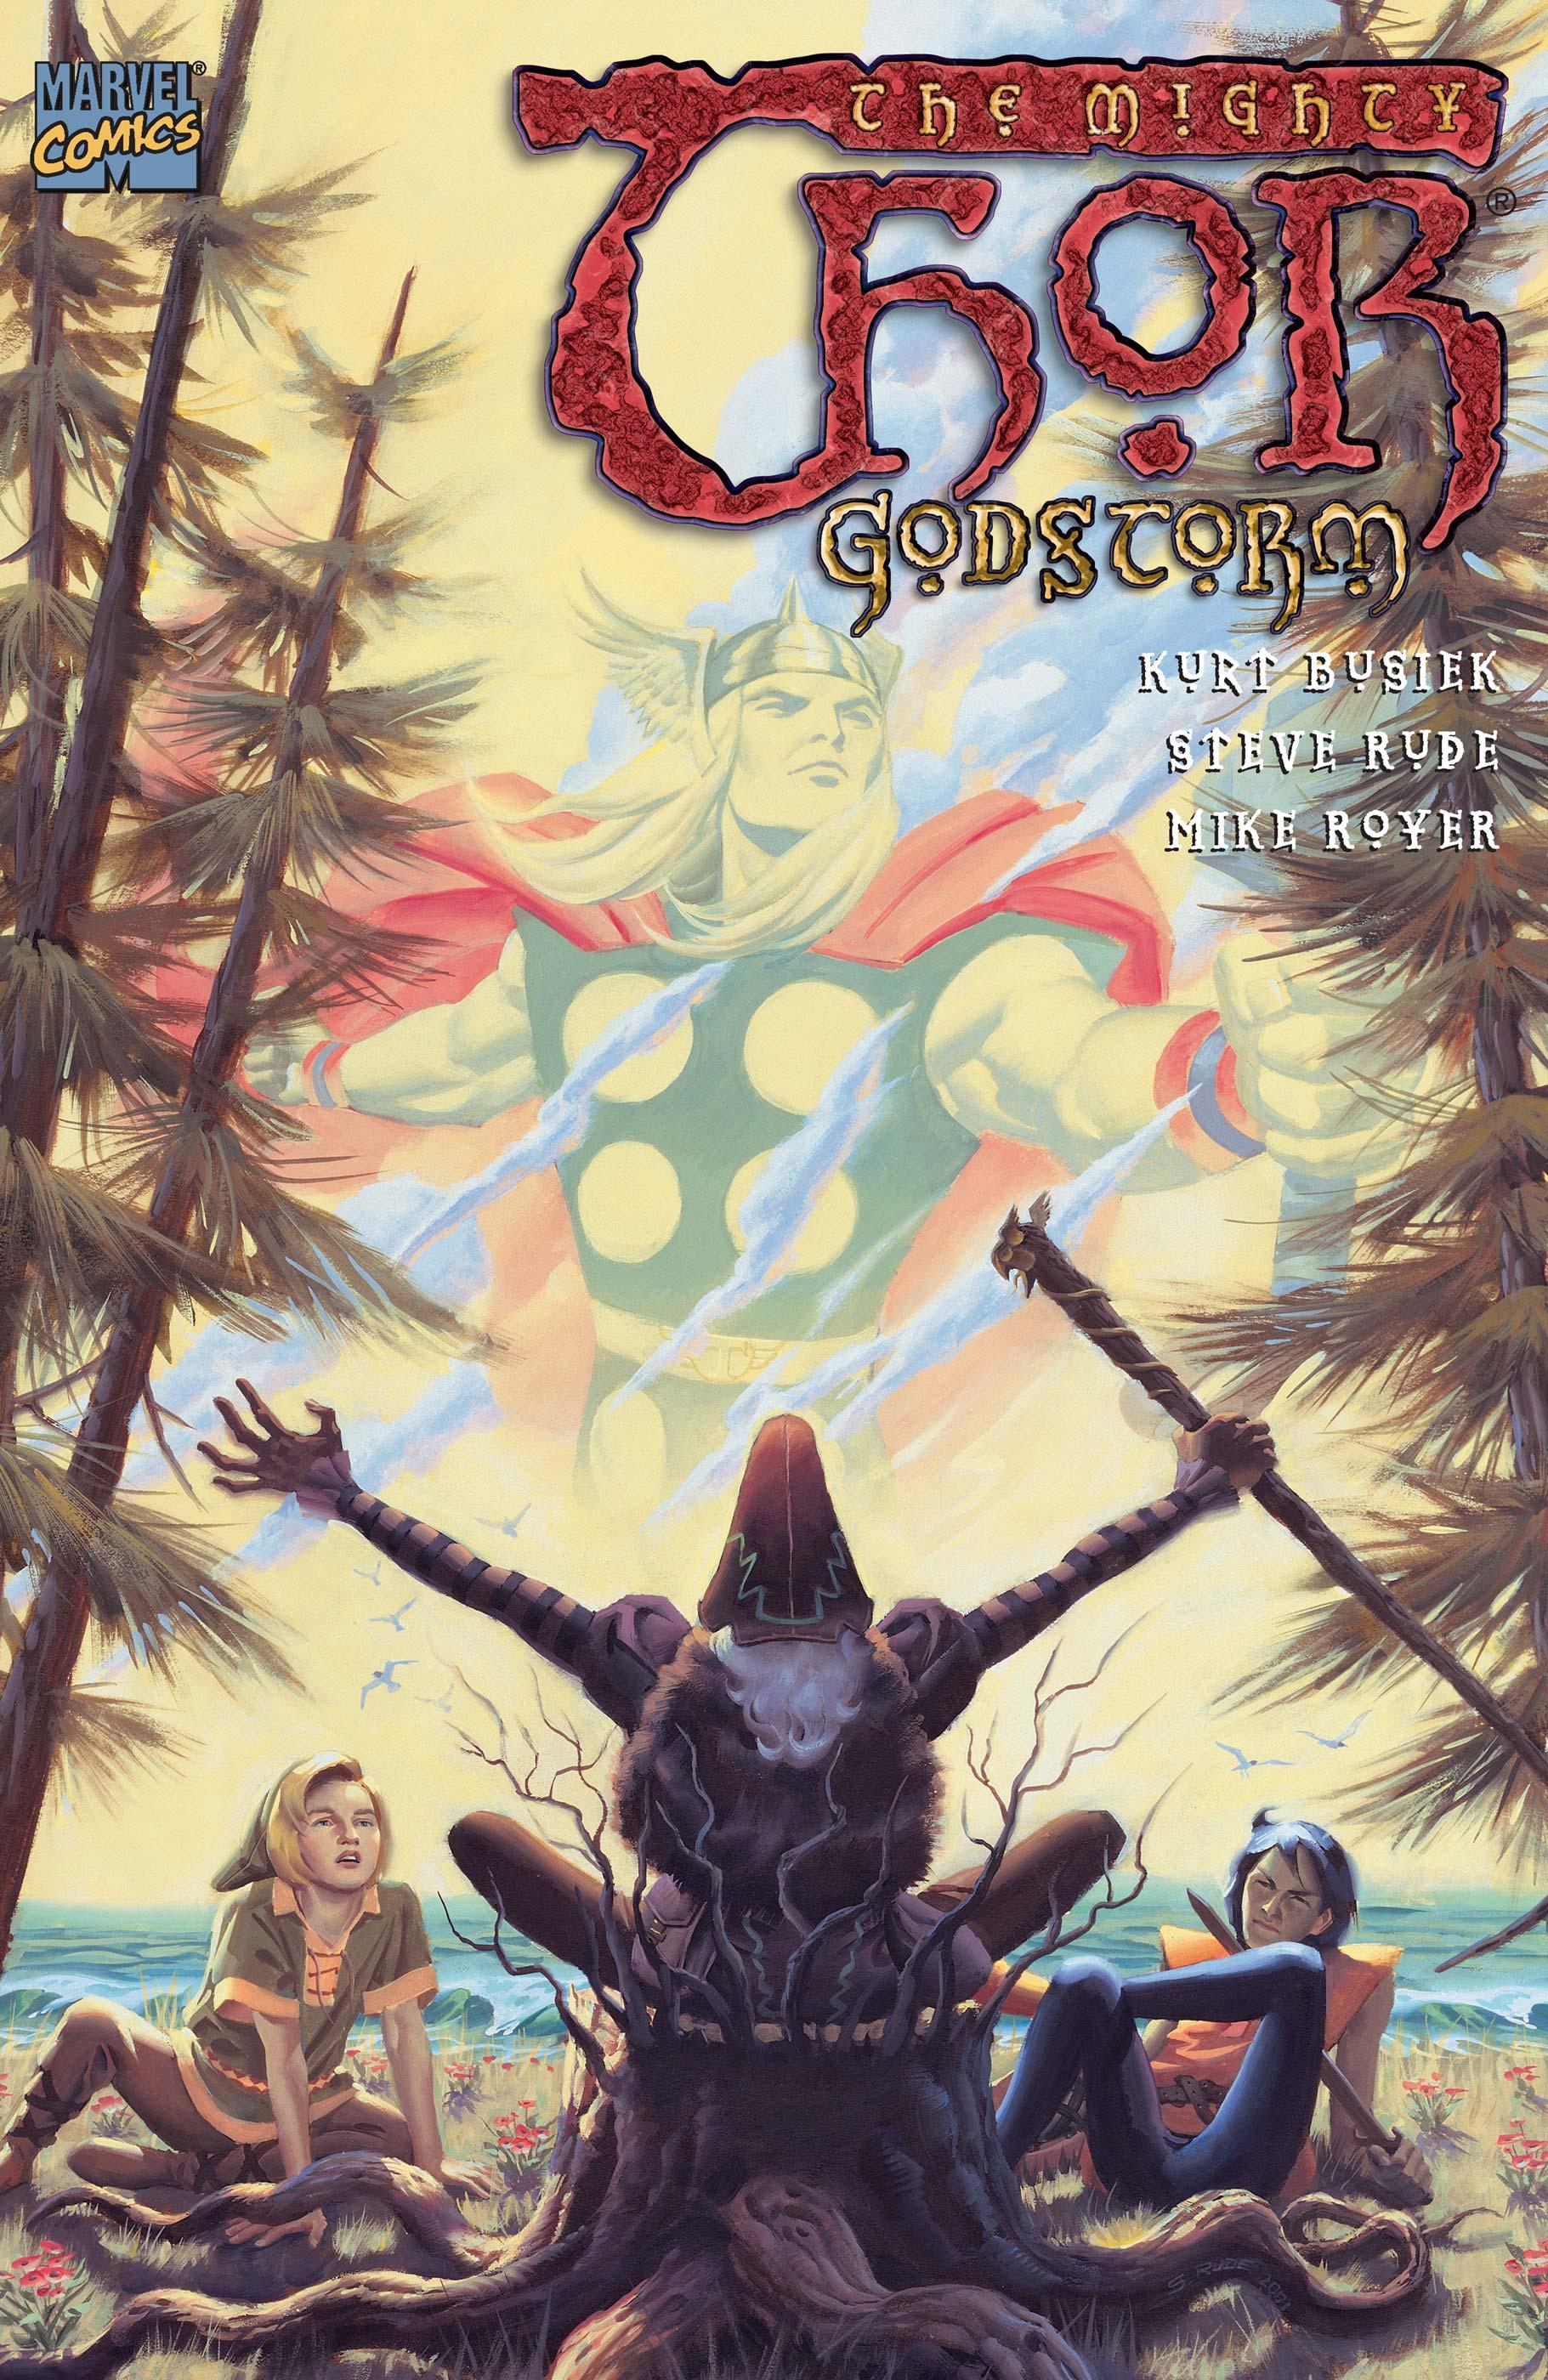 Thor: Godstorm (2001) #1